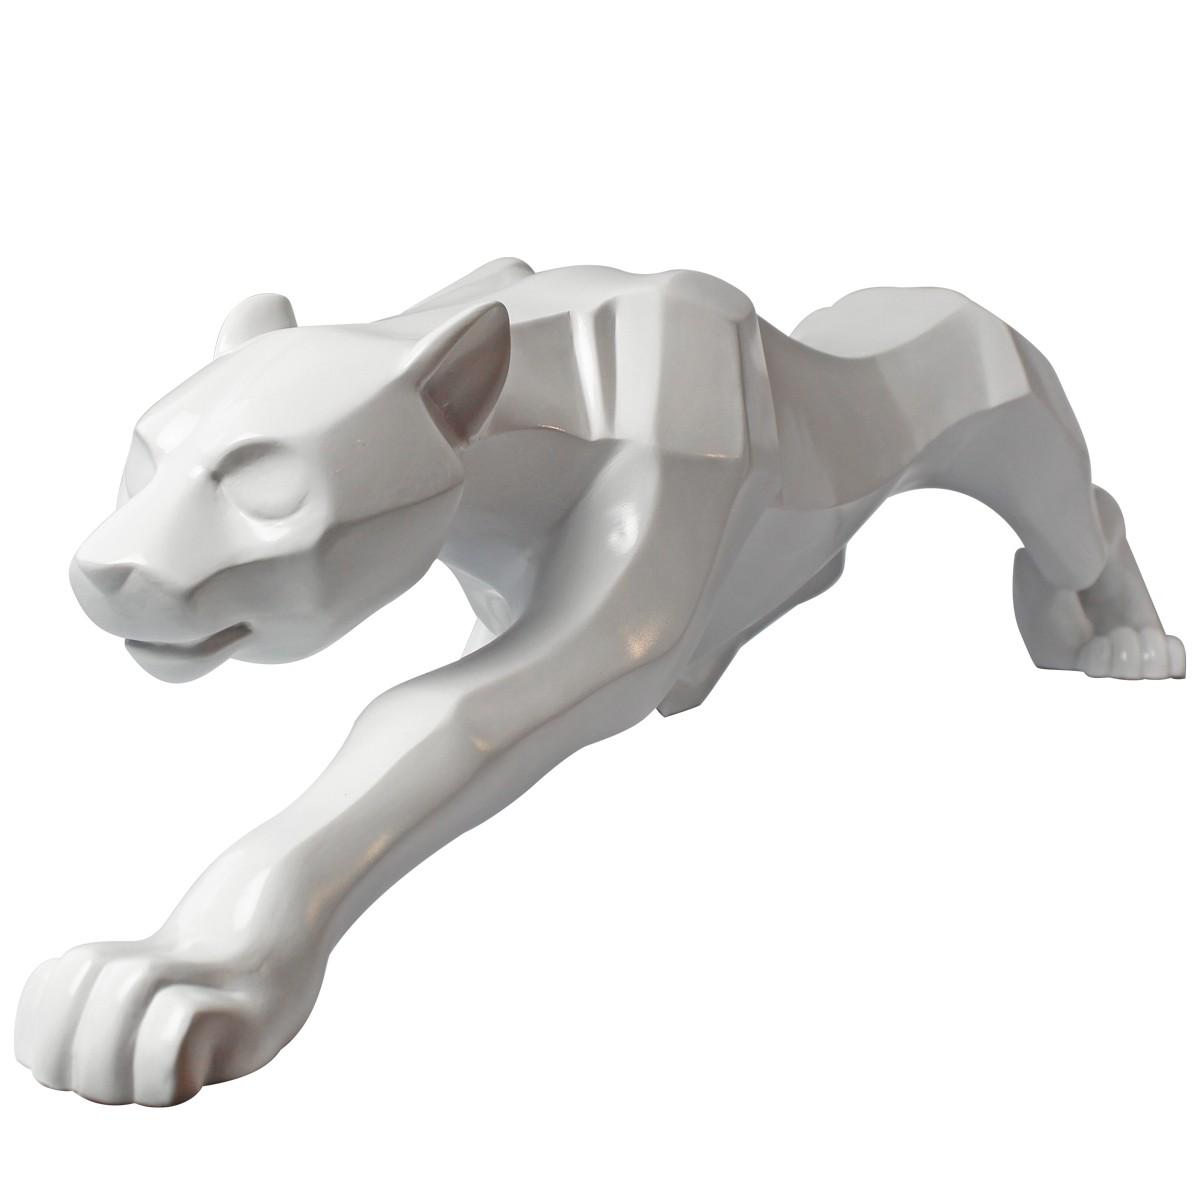 Enfeite Leopardo Decorativo De Cerâmica Branco 66cm Verito